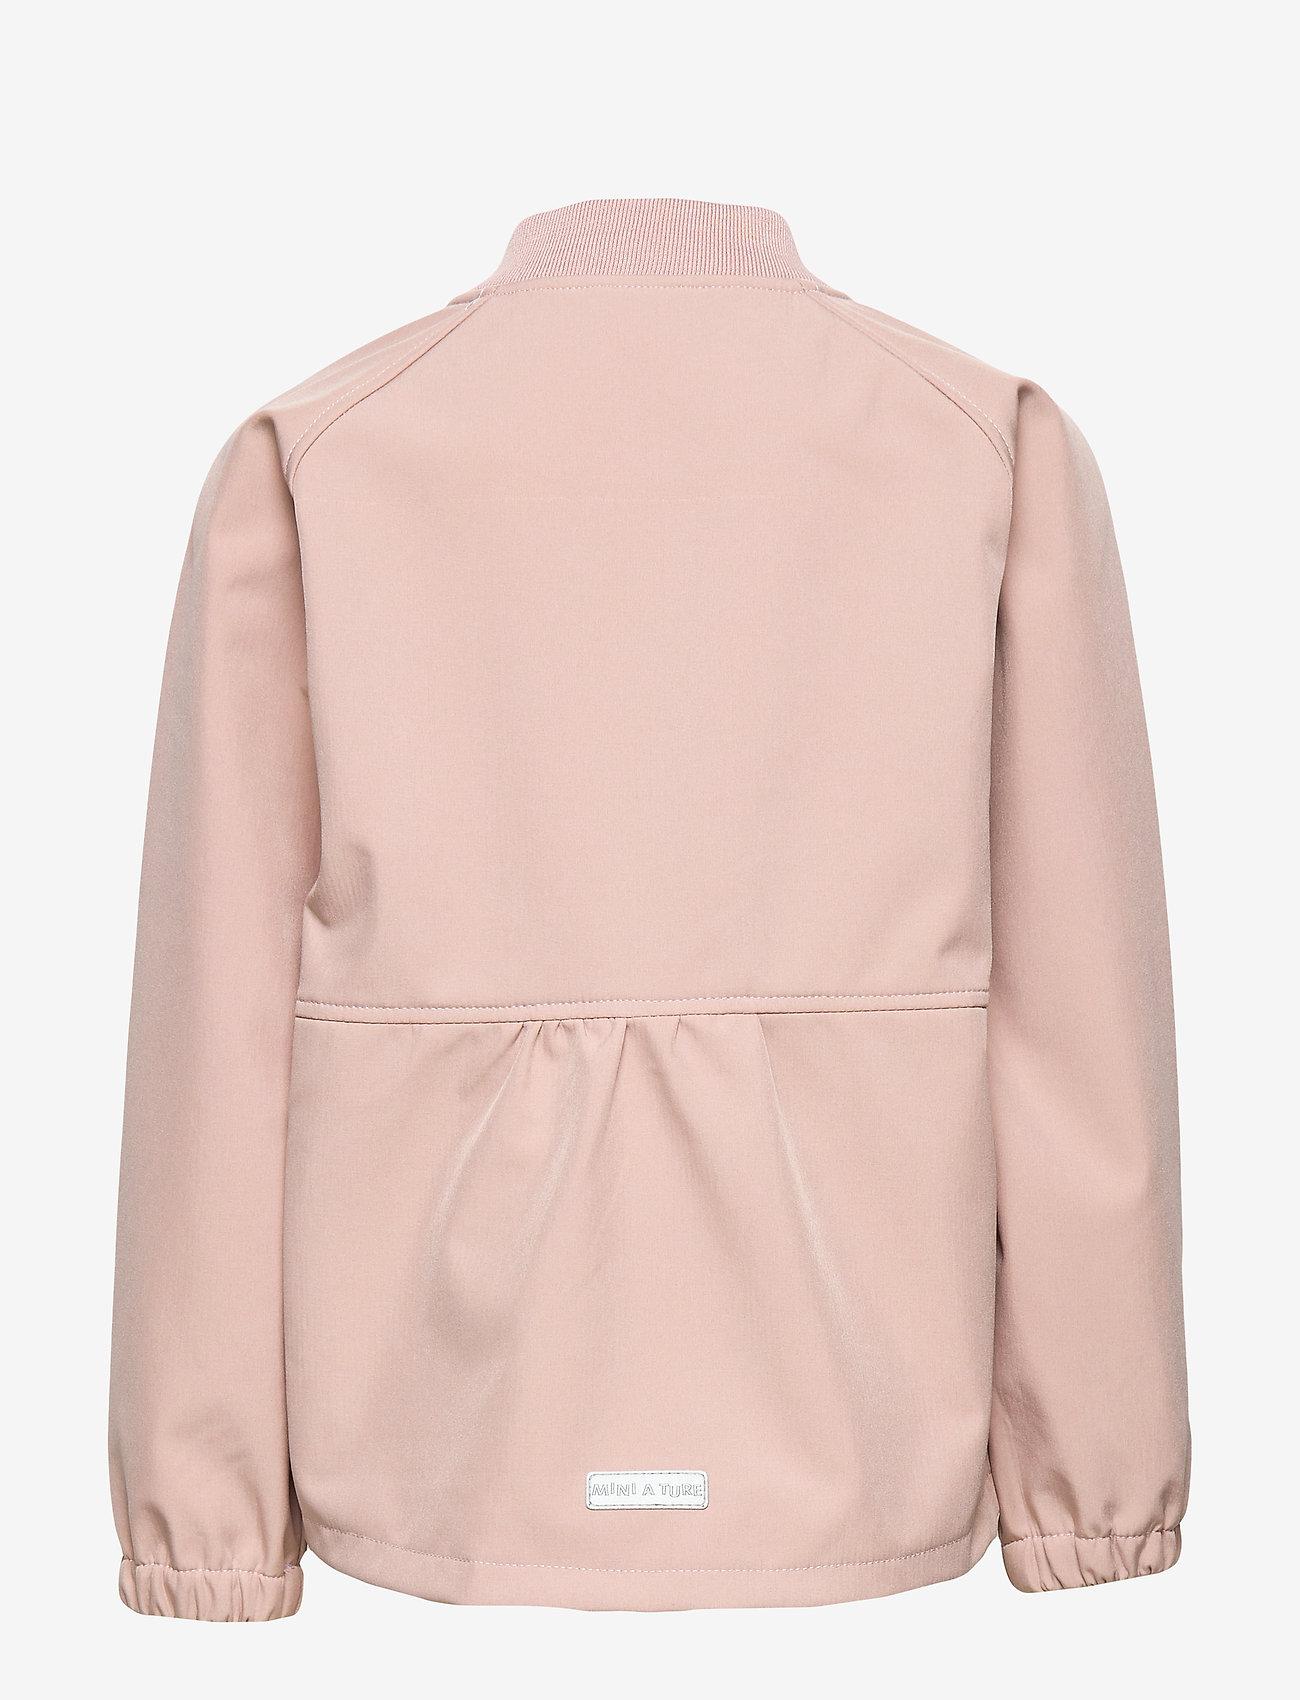 Mini A Ture - Bridget Jacket, MK - softshell jassen - muted lilac - 1